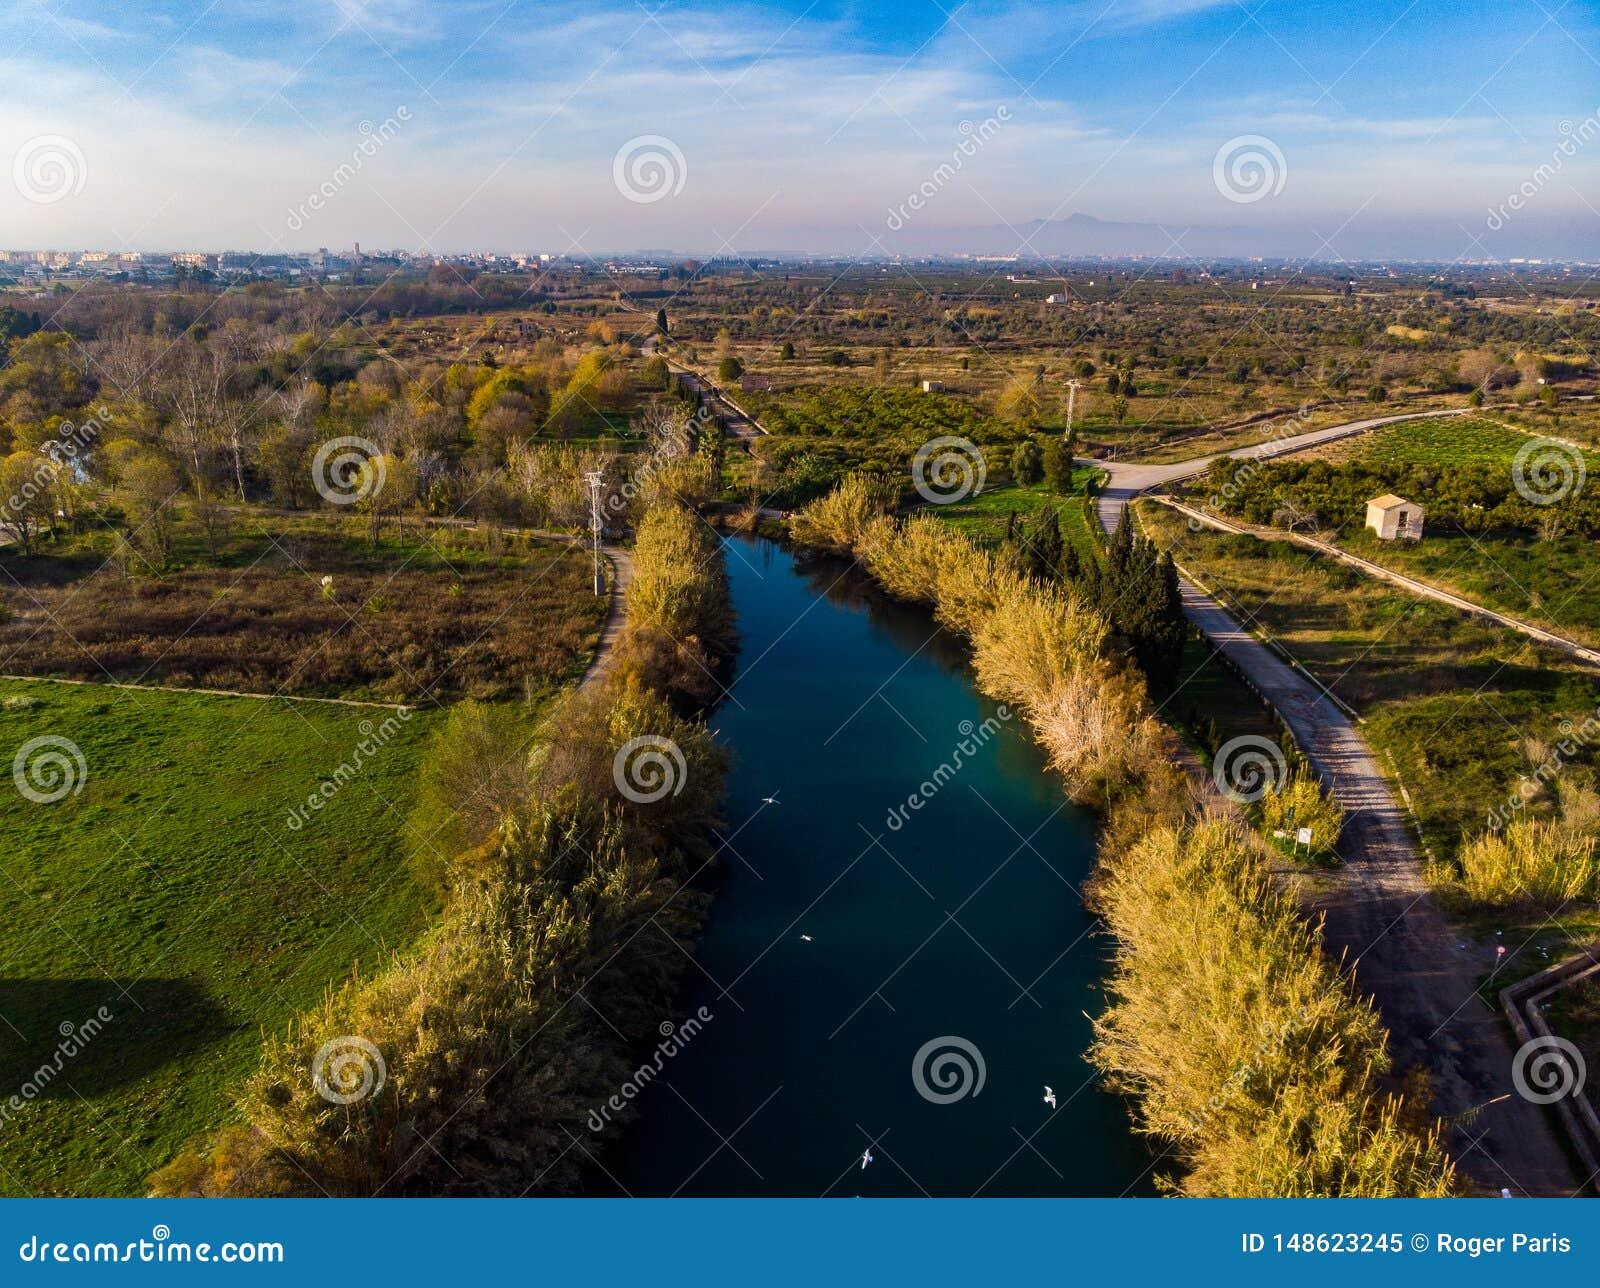 El Clot. River in Burriana. Spain